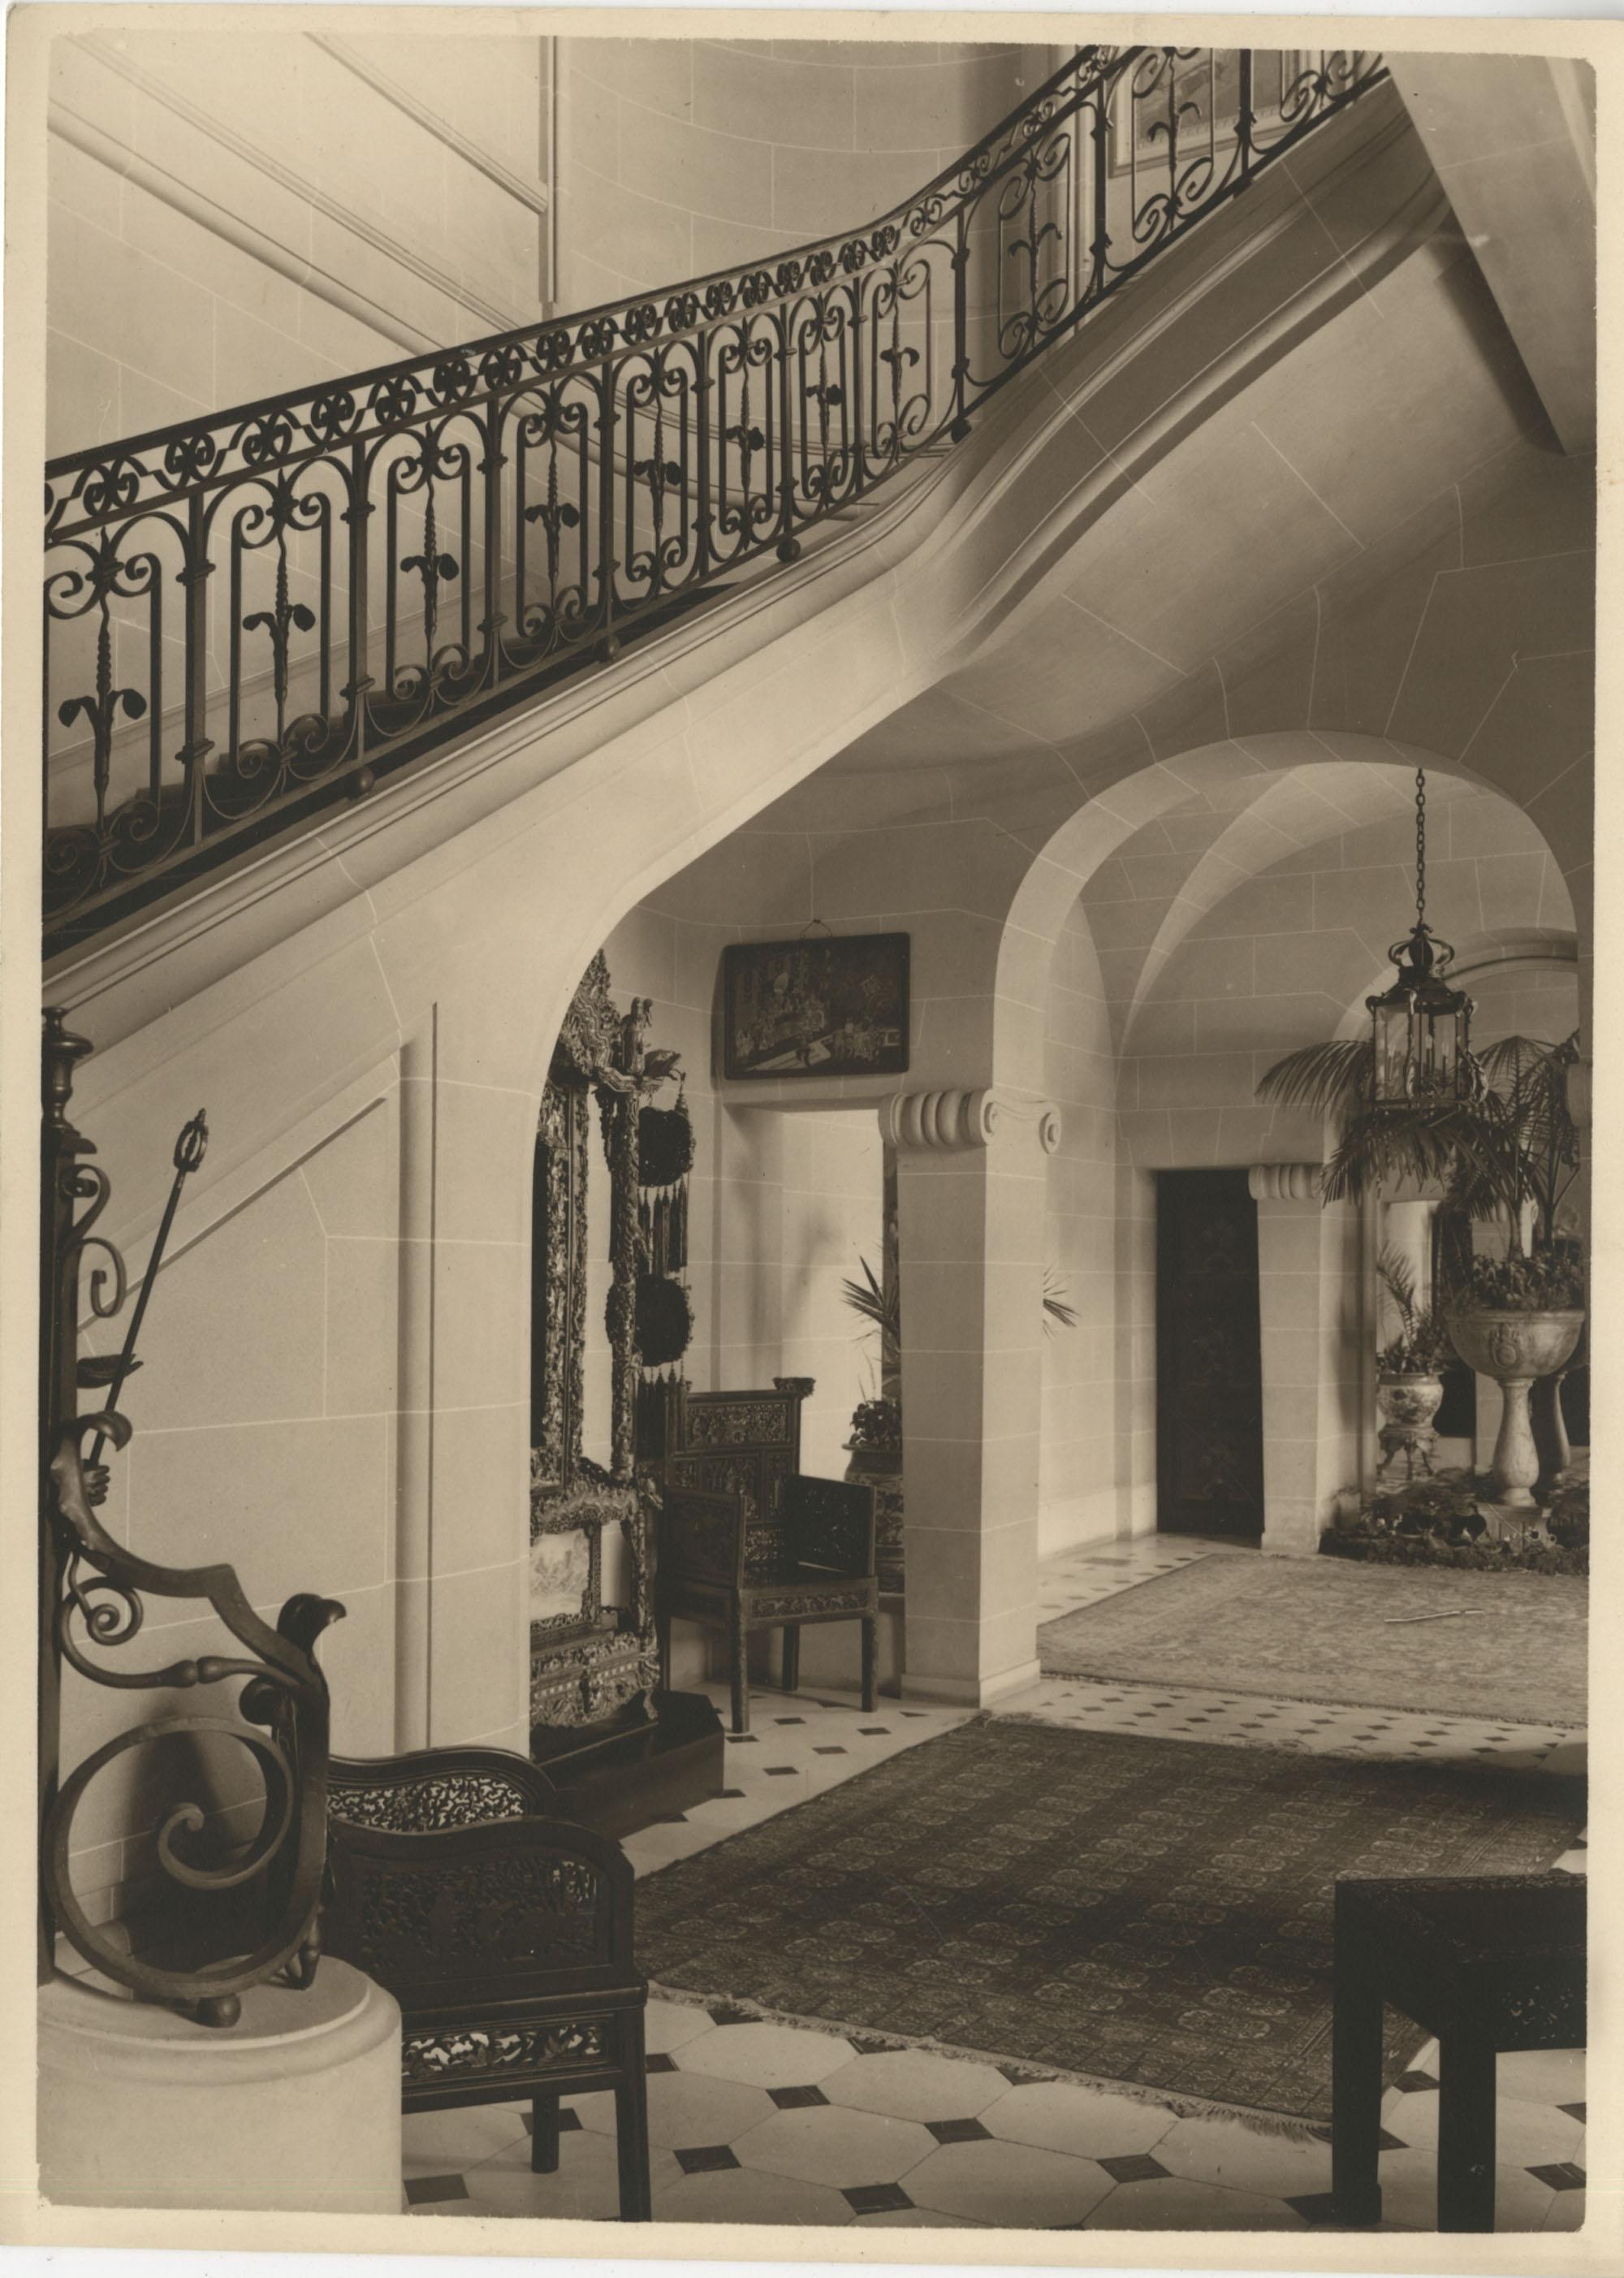 Interior of the Royal Italian Consul in Sri Lanka, Photograph 23